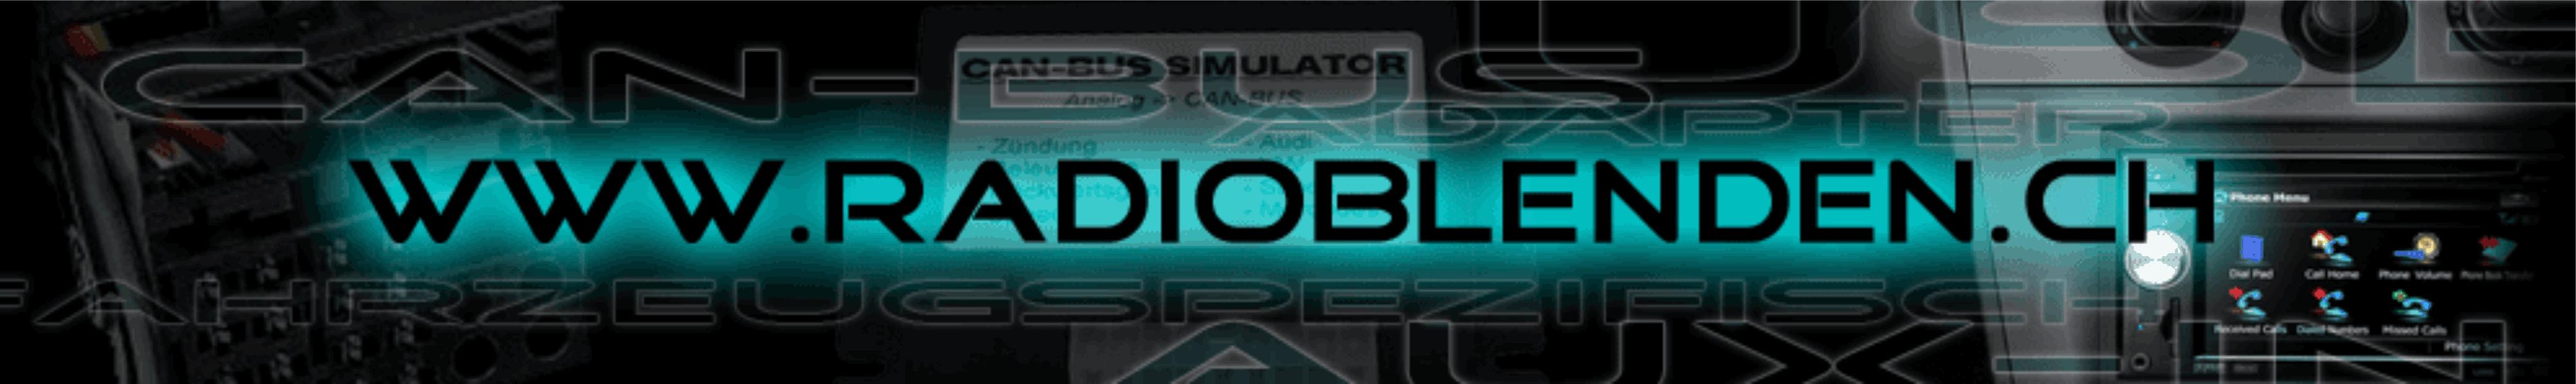 www.radioblenden.ch-Logo